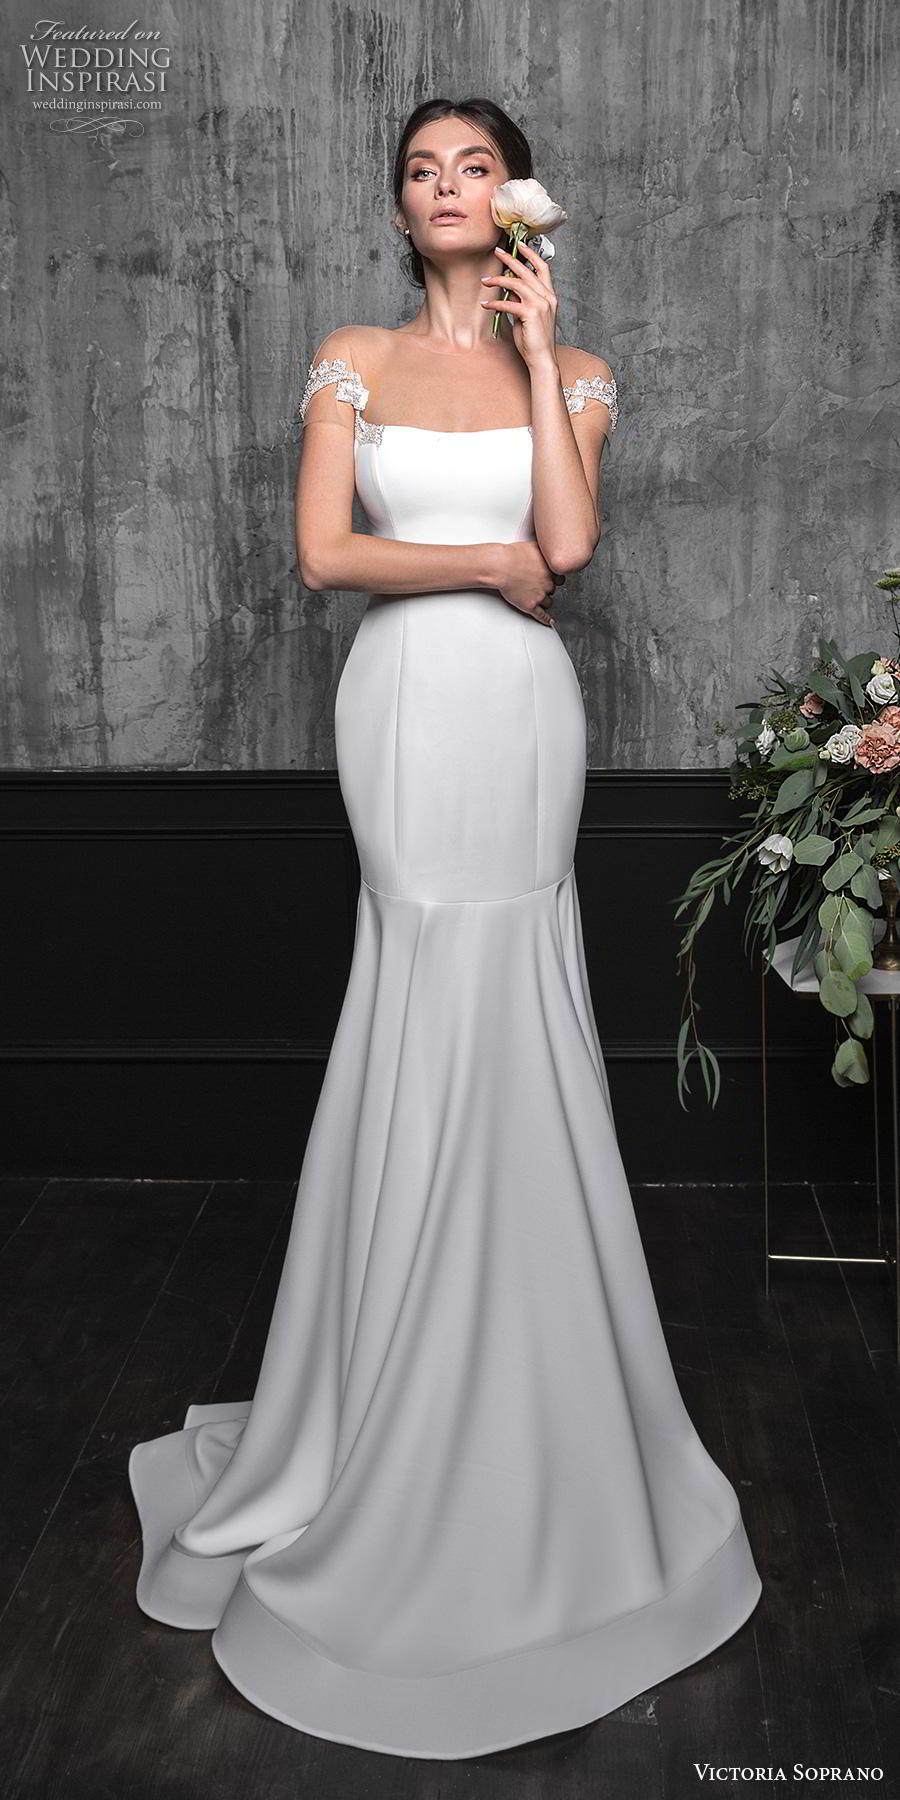 Victoria Soprano 2020 Wedding Dresses Chic Royal